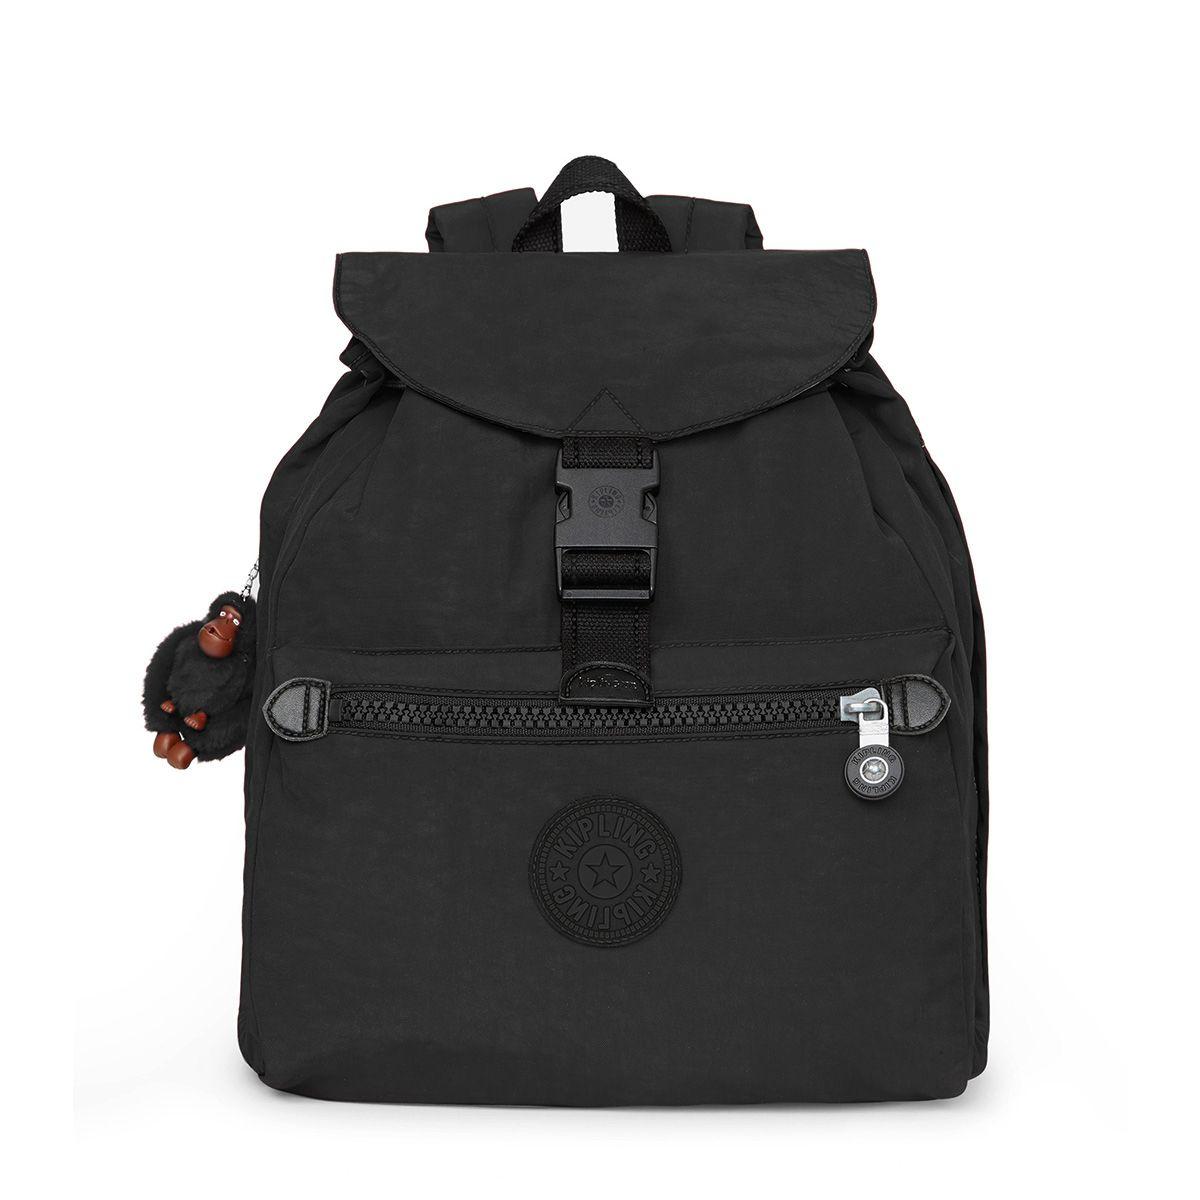 5fdbaf2a88 Accessories · Backpacks